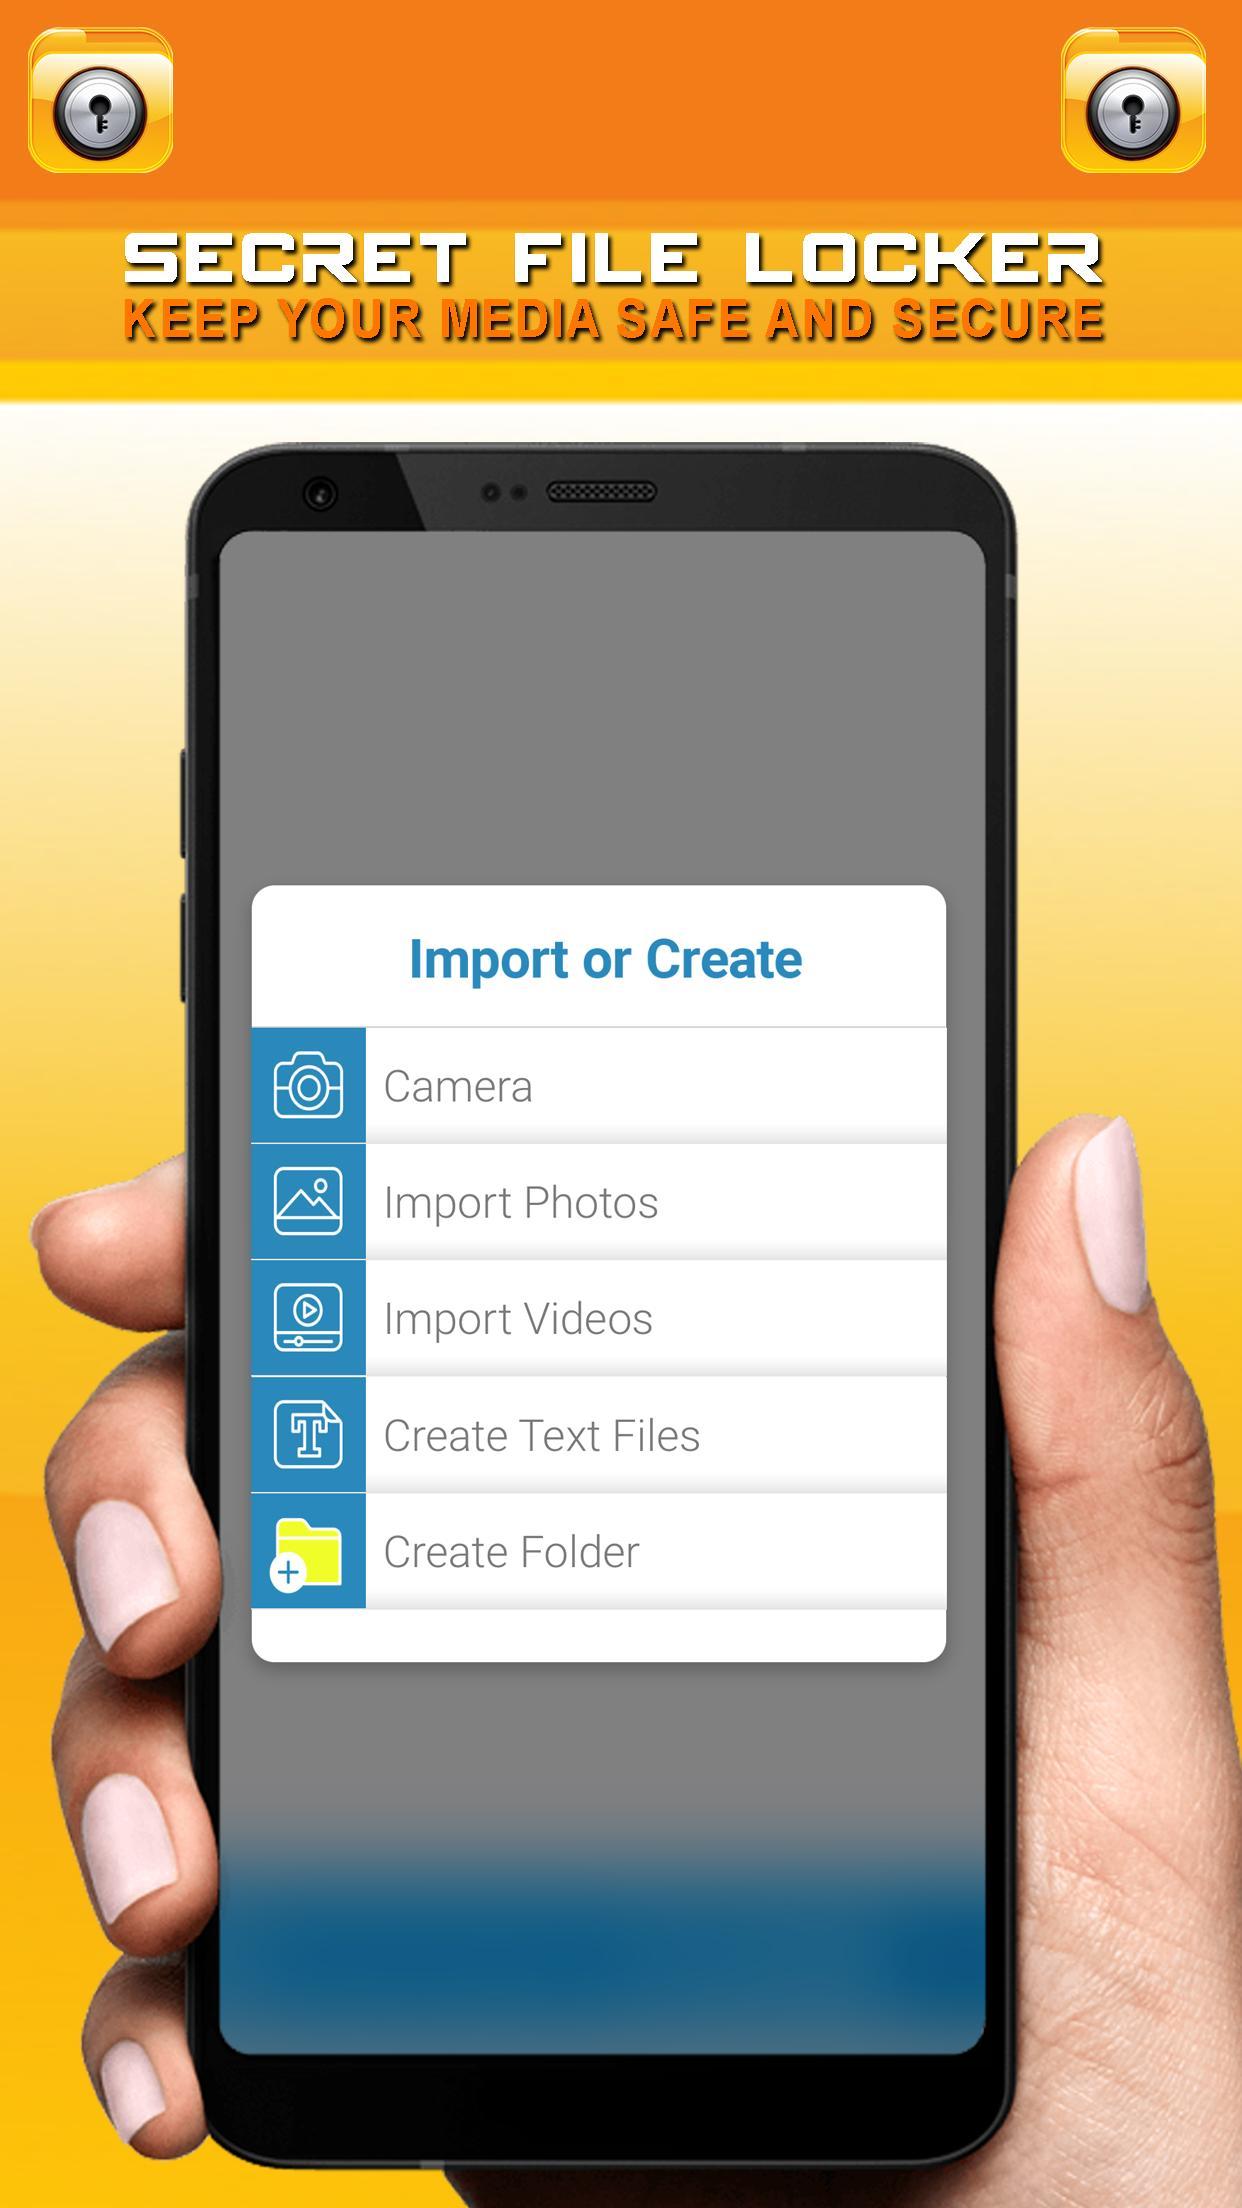 Secret File Locker - Security Lock App for Android - APK Download